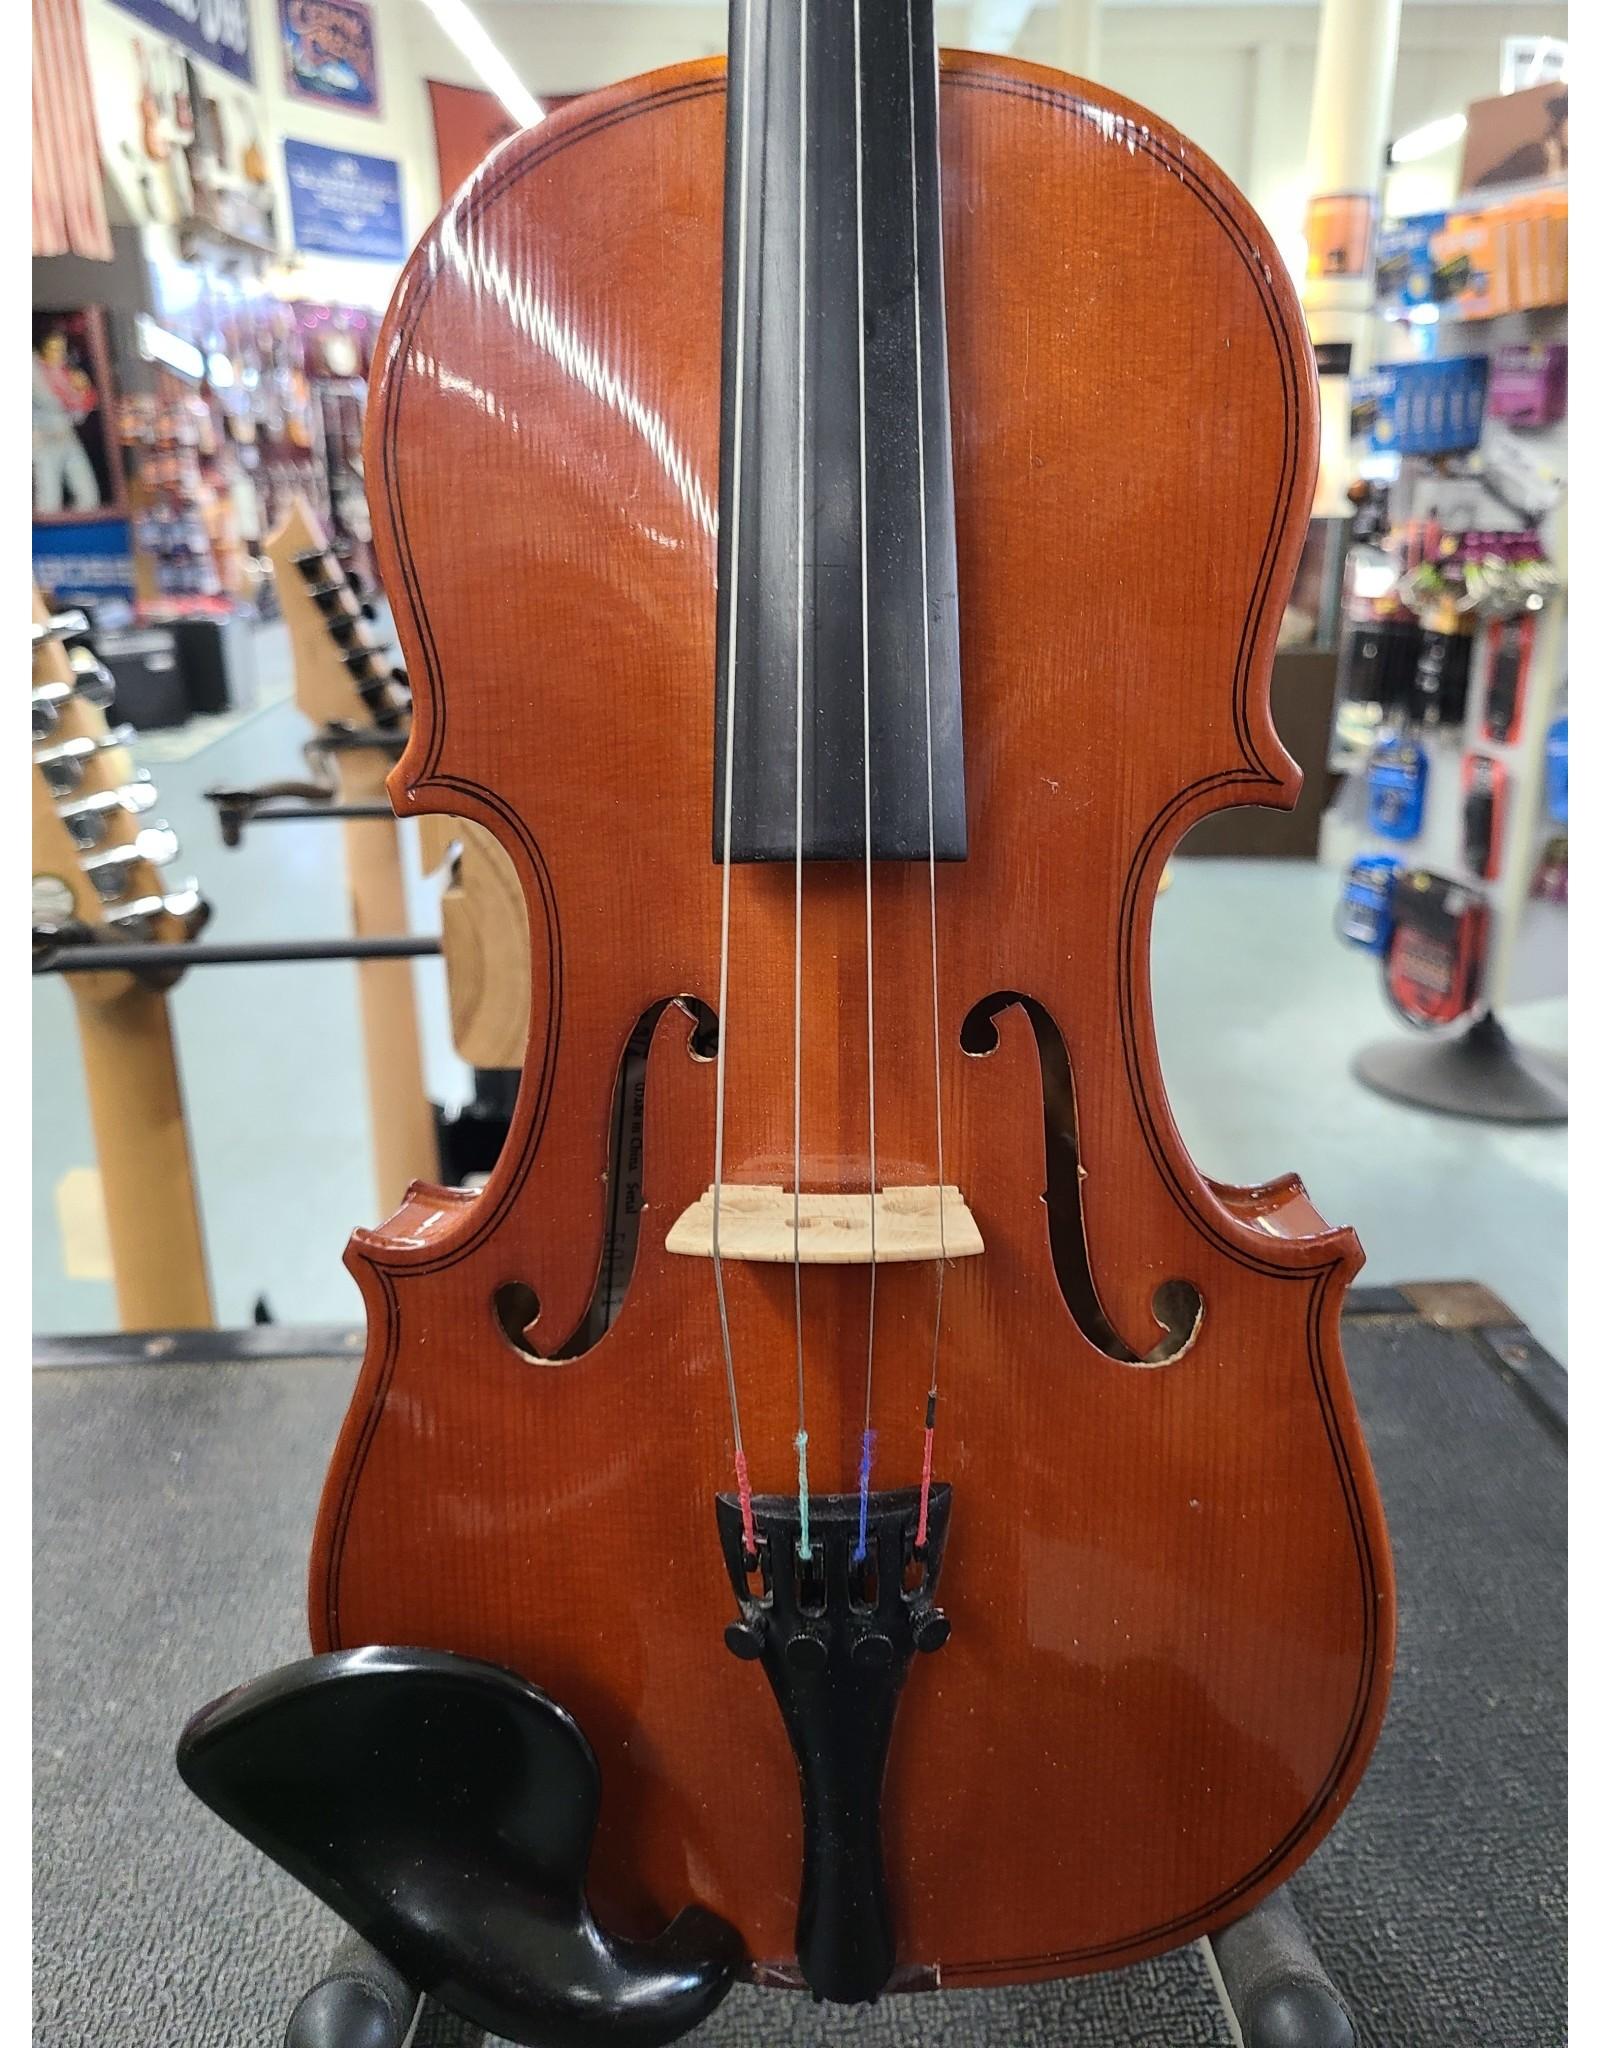 Cremona Cremona CV-700 3/4  Student Violin Outfit (used)